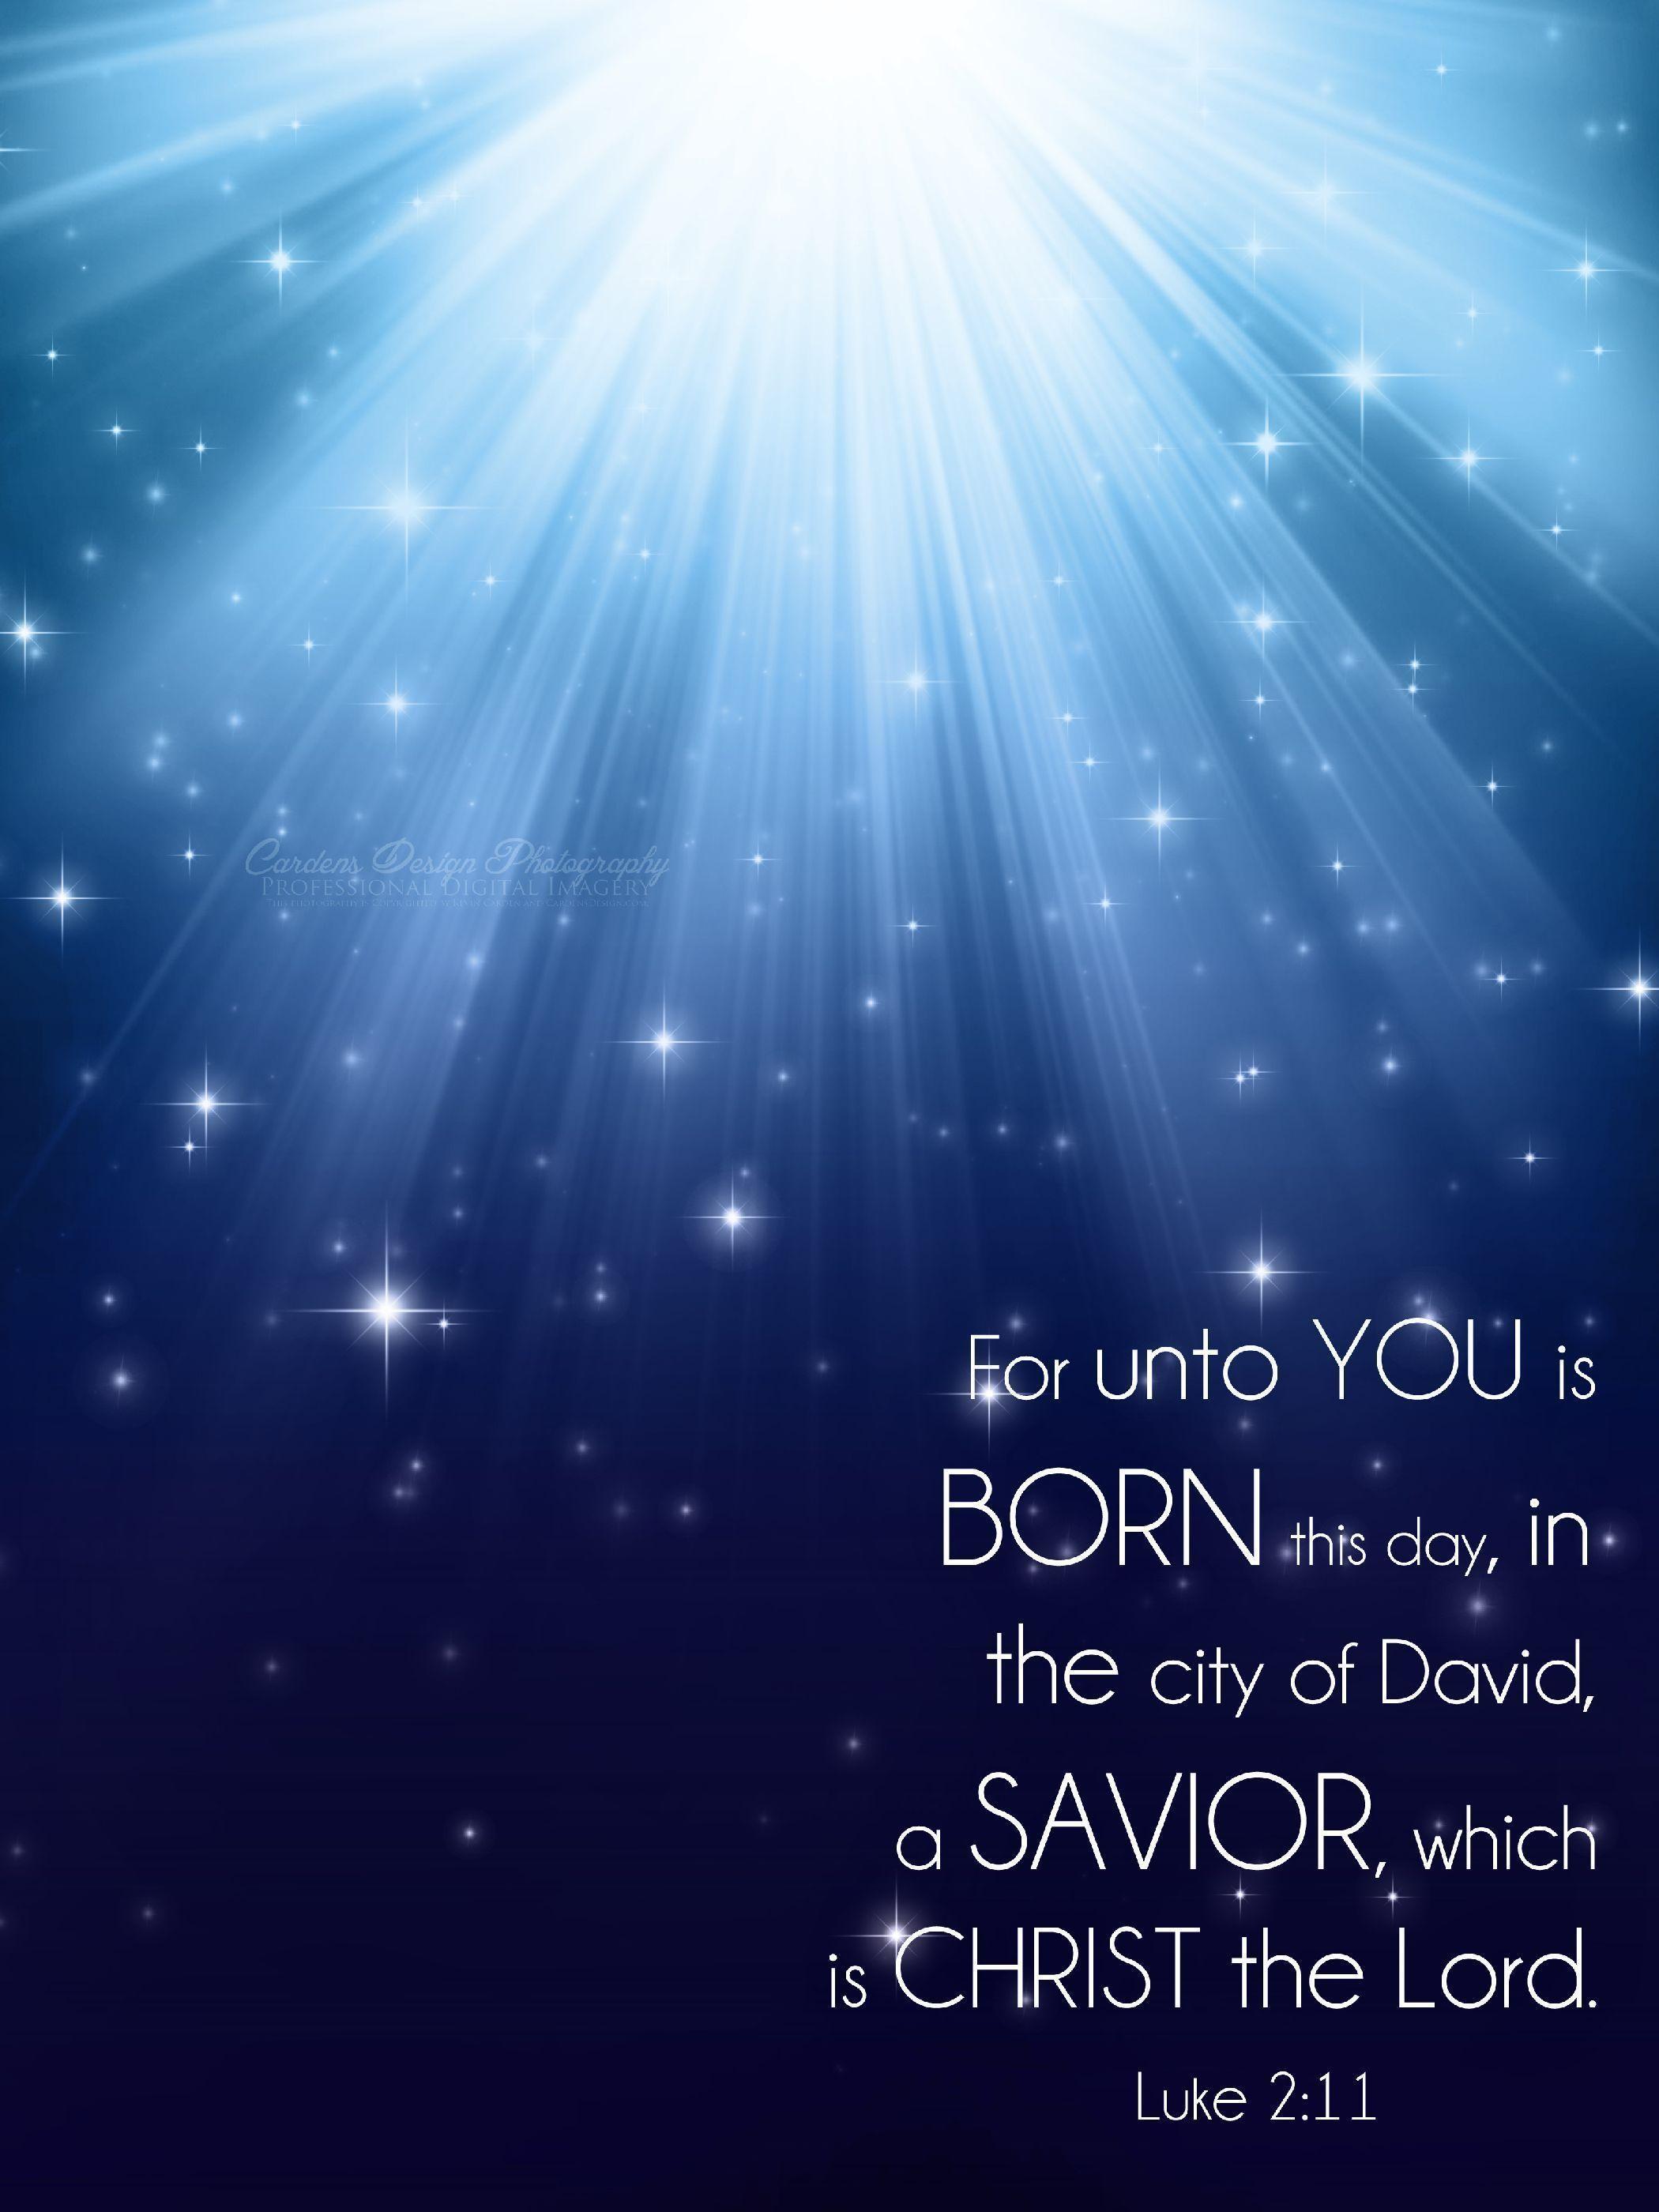 Christian Christmas Desktop Wallpaper (53+ images)